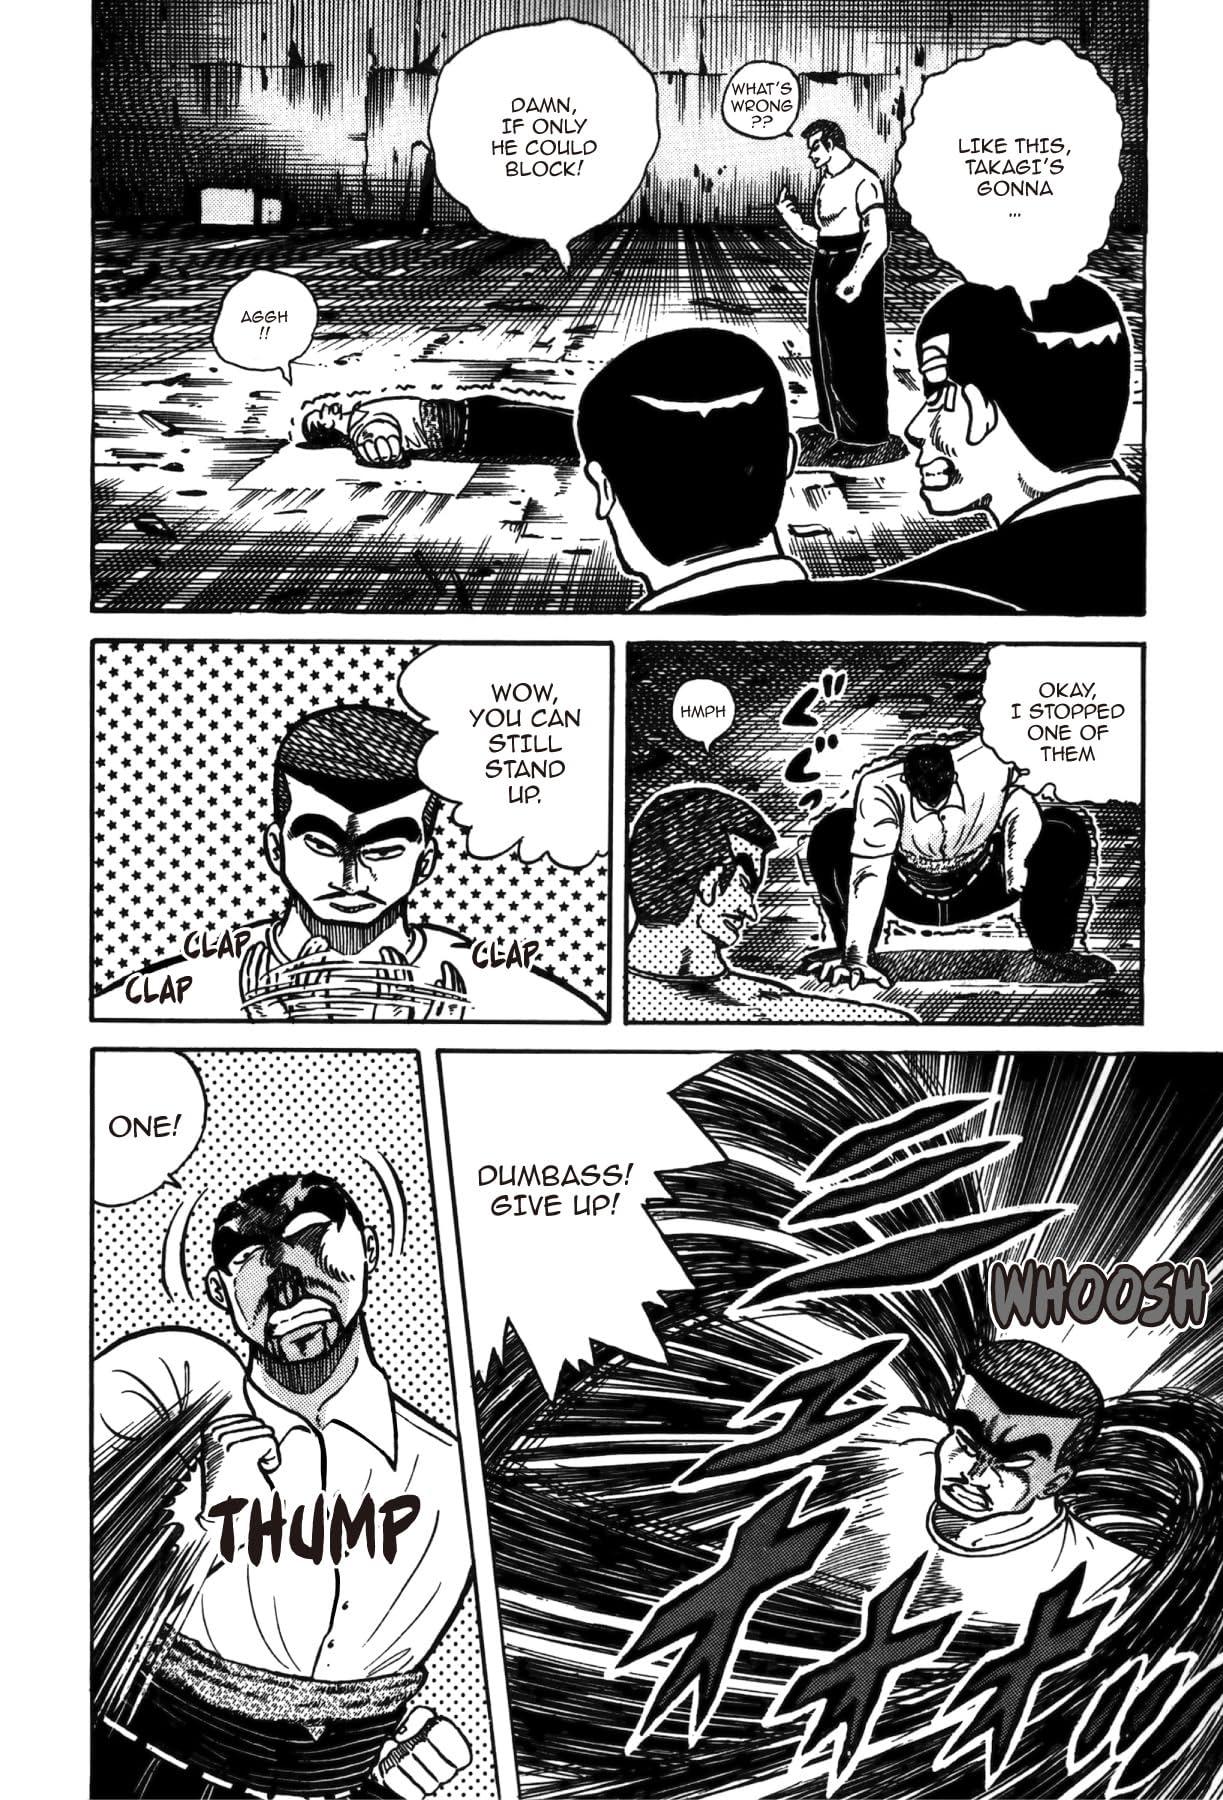 Osu! Karate Club #25